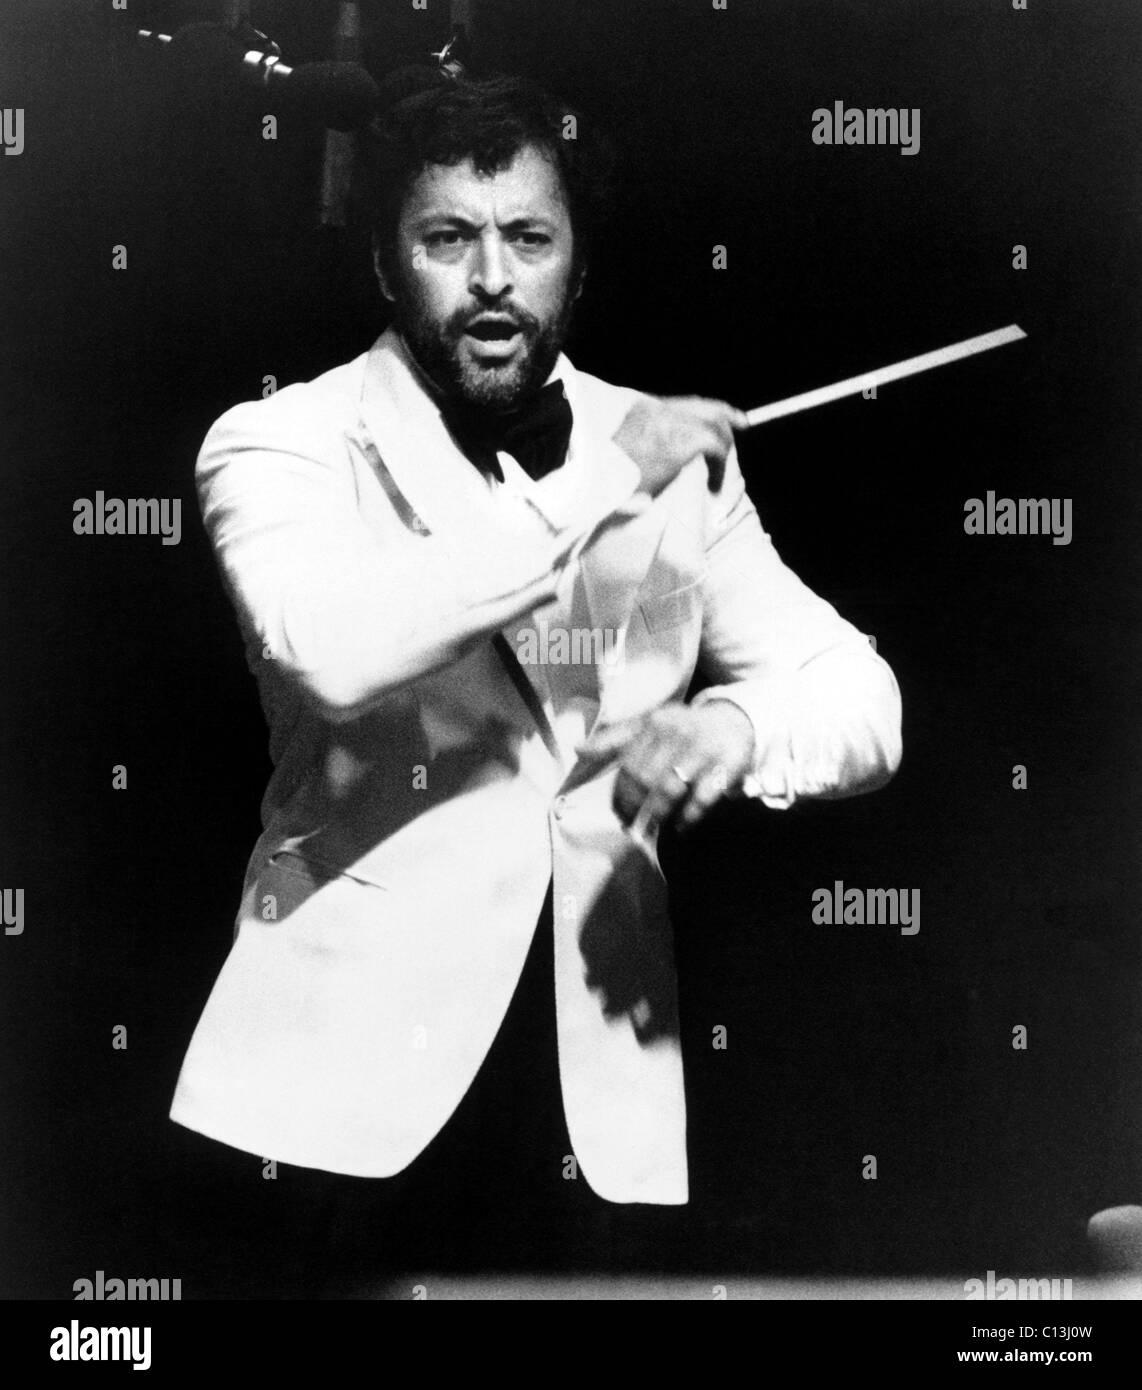 Zubin Mehta, ca. 1970s - Stock Image